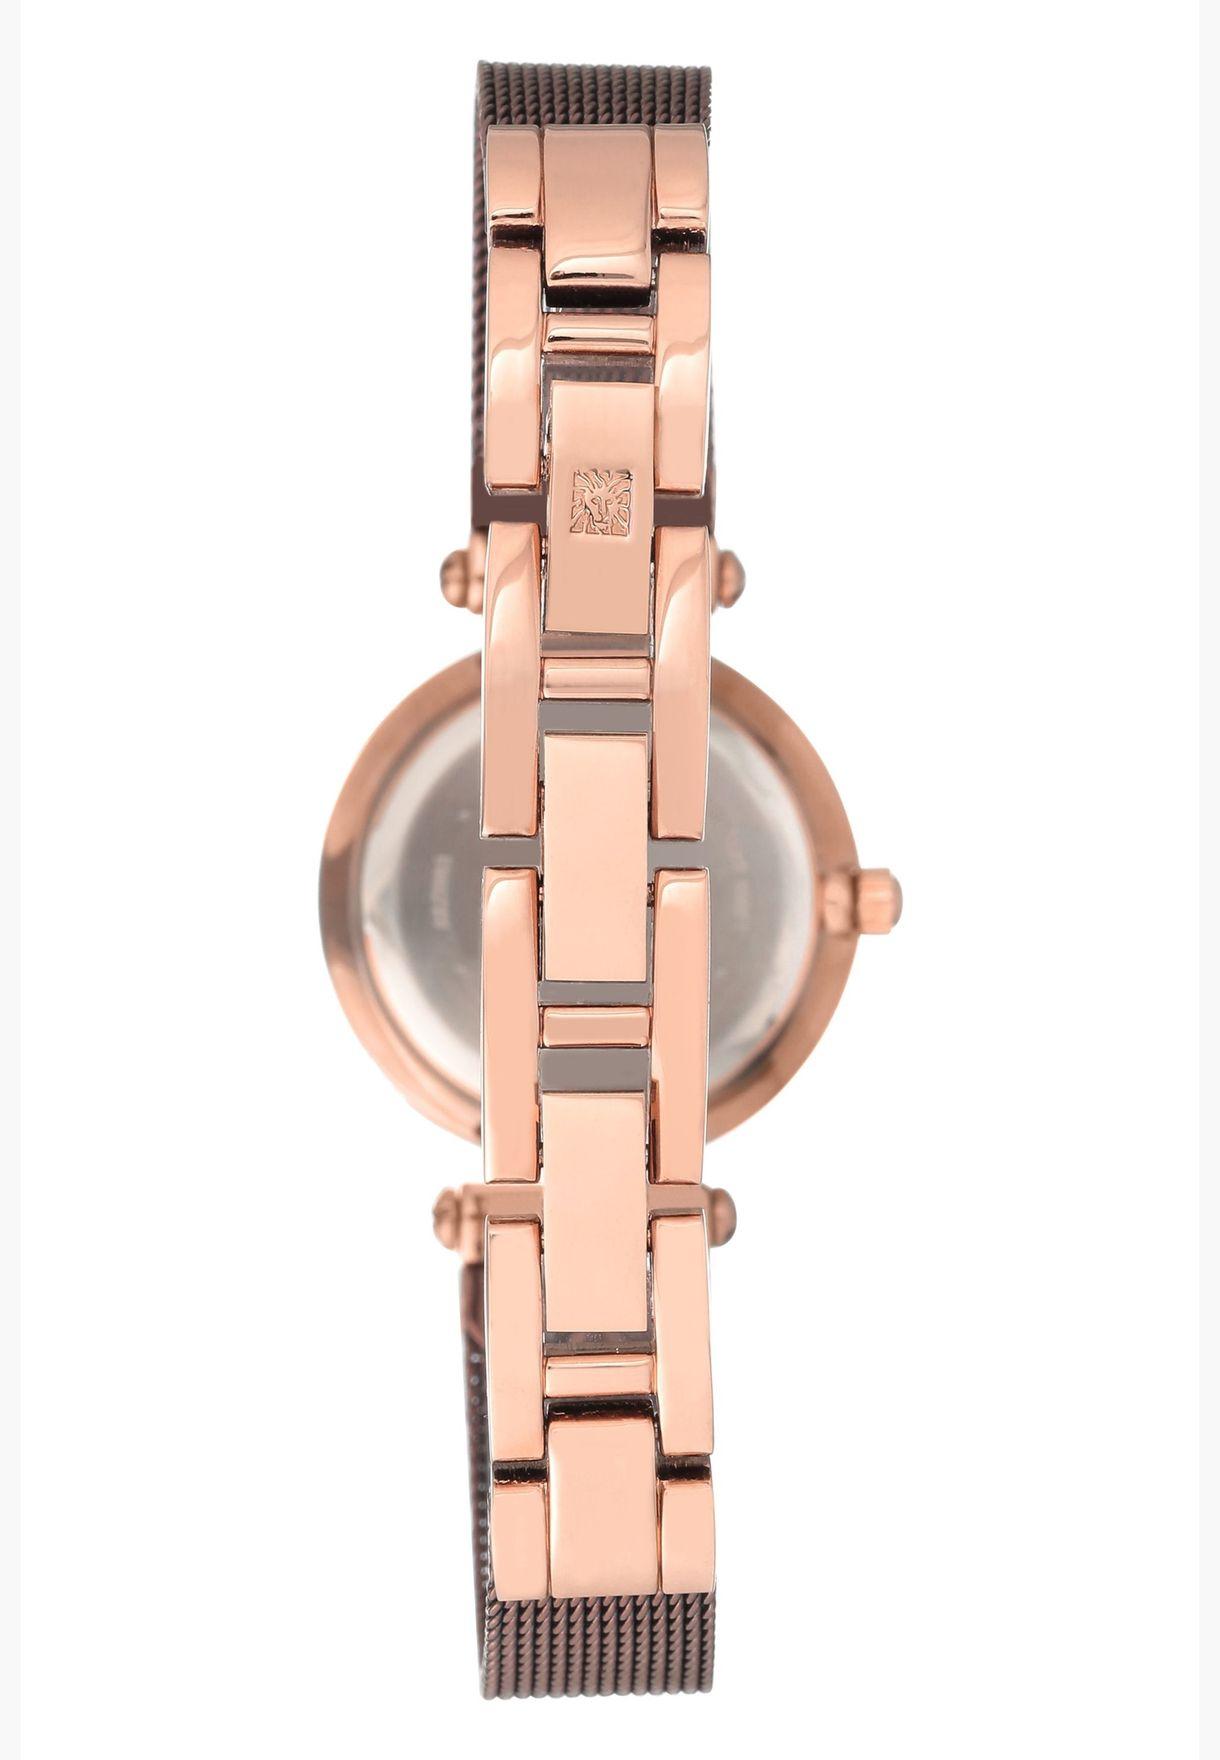 Anne Klein Diamond Steel Strap Watch for Women - AK3003RGBN